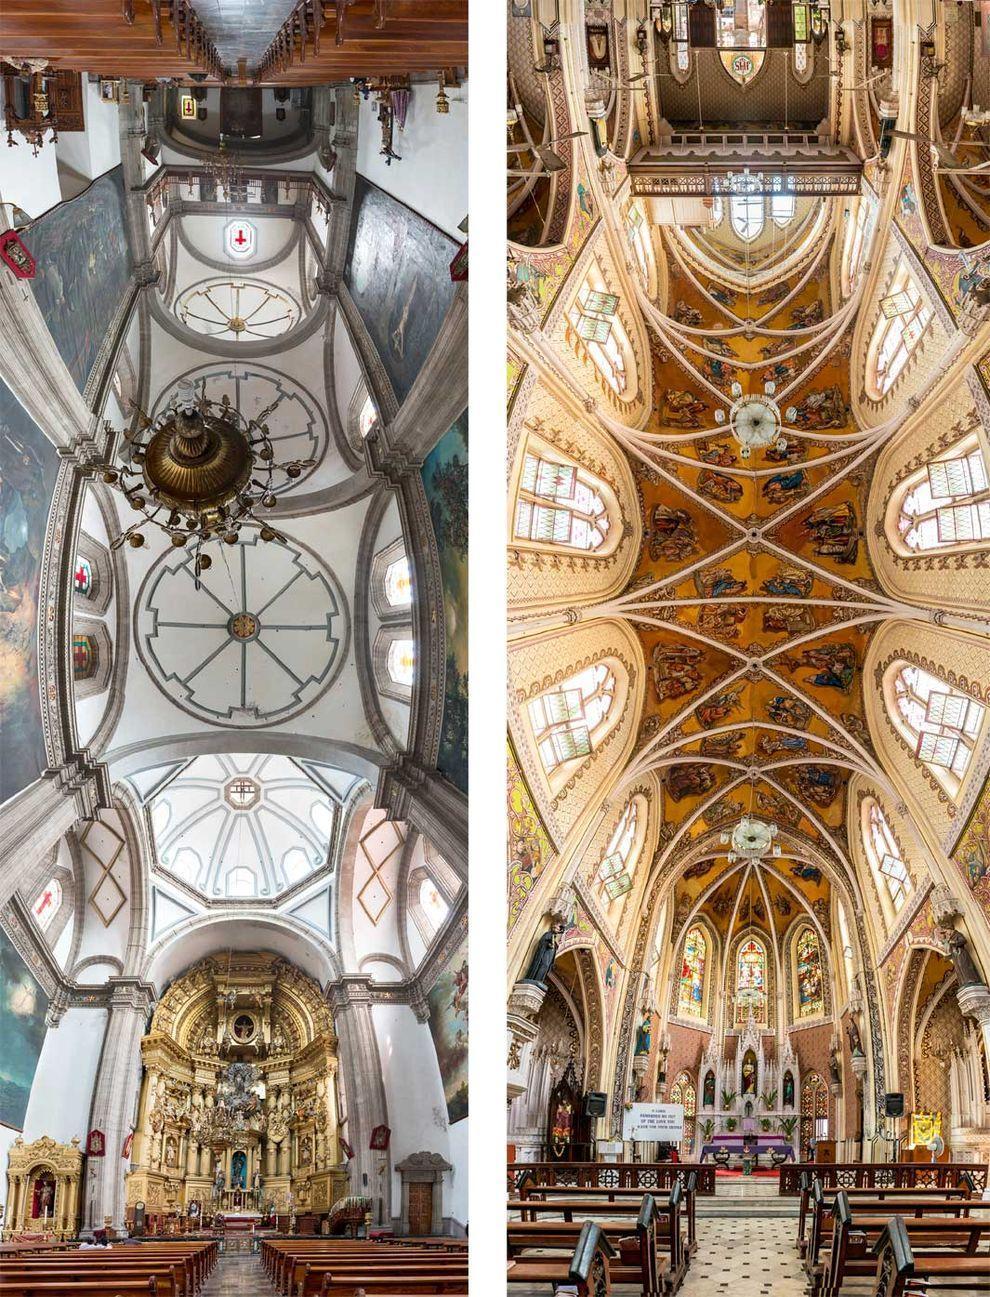 Church04 Потрясающие снимки храмов от входа до алтаря в одном фото